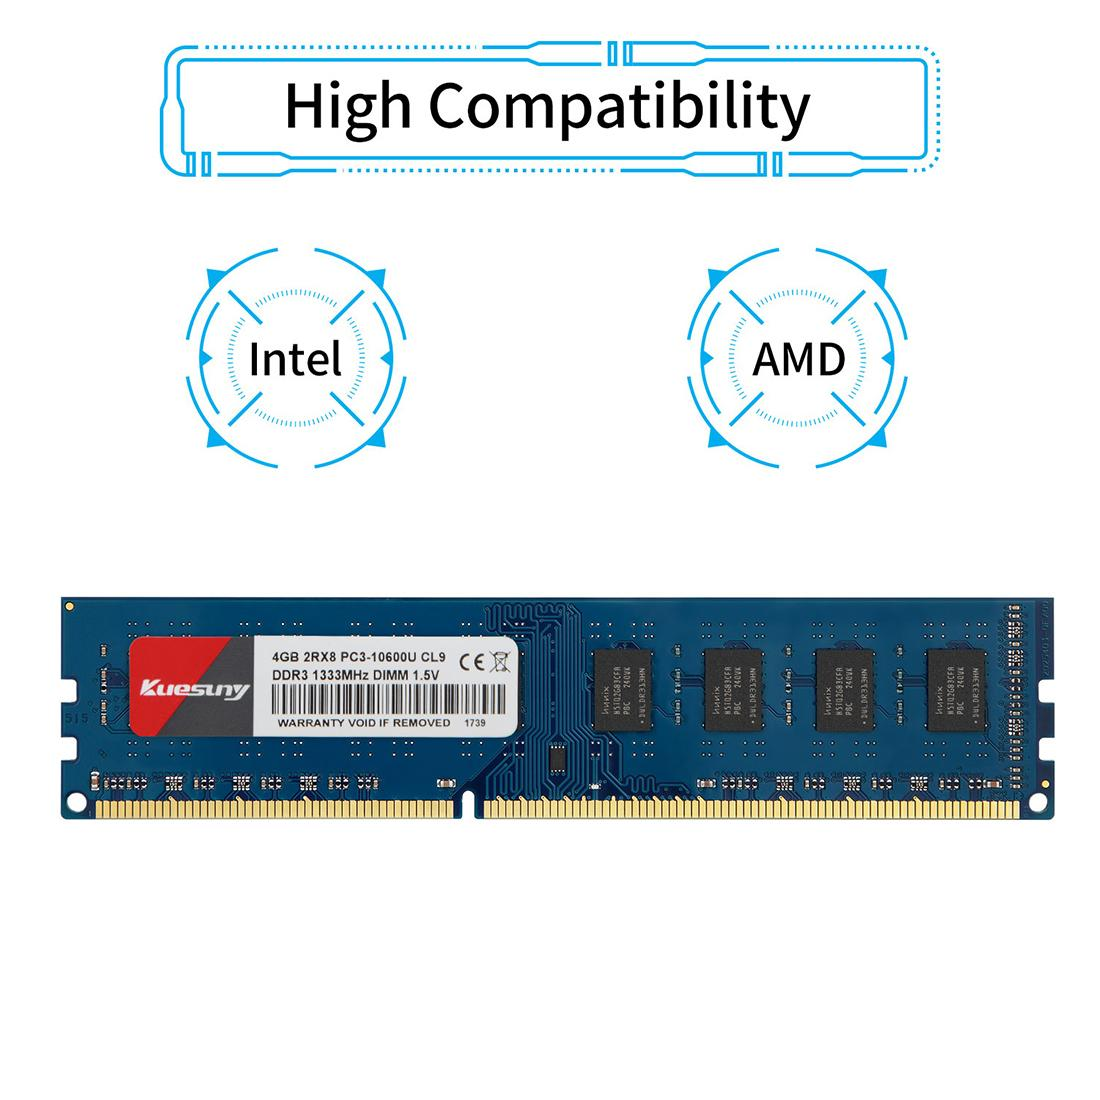 Kuesuny 8GB ram DDR3L-1600 Udimm PC3L-12800U CL11 240 Pin 2RX8 Dual Rank Non ECC Unbuffered 1.35VDesktop Computer Memory Ram Module Upgrade(Blue)